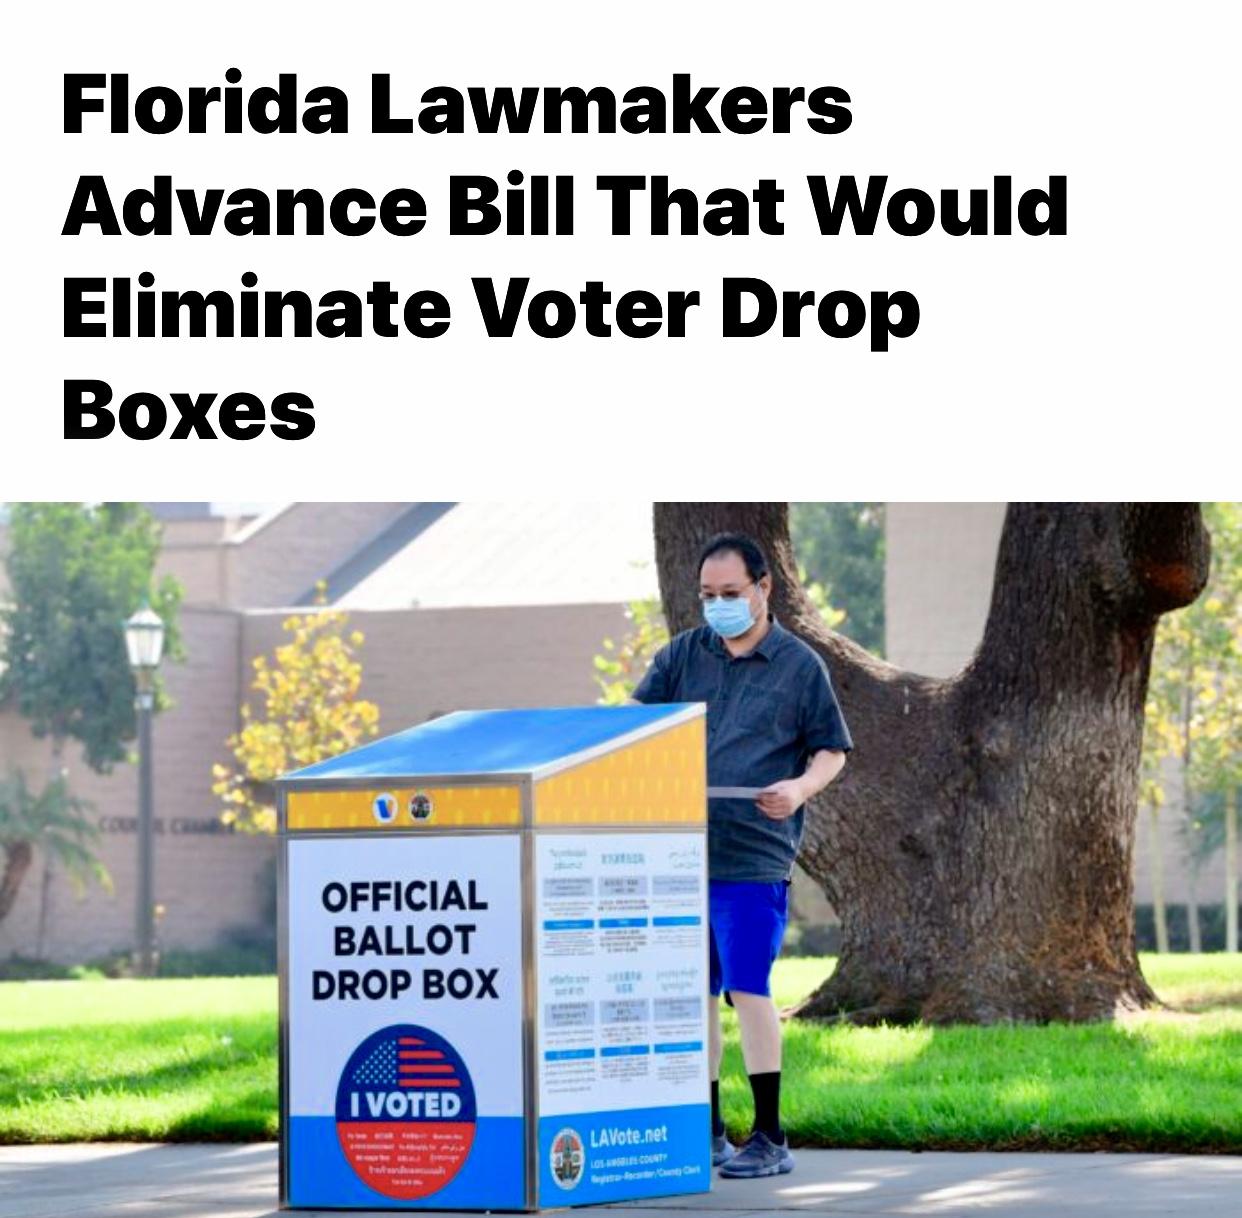 Florida Lawmakers Advance Bill That Would Eliminate Voter Drop Boxes